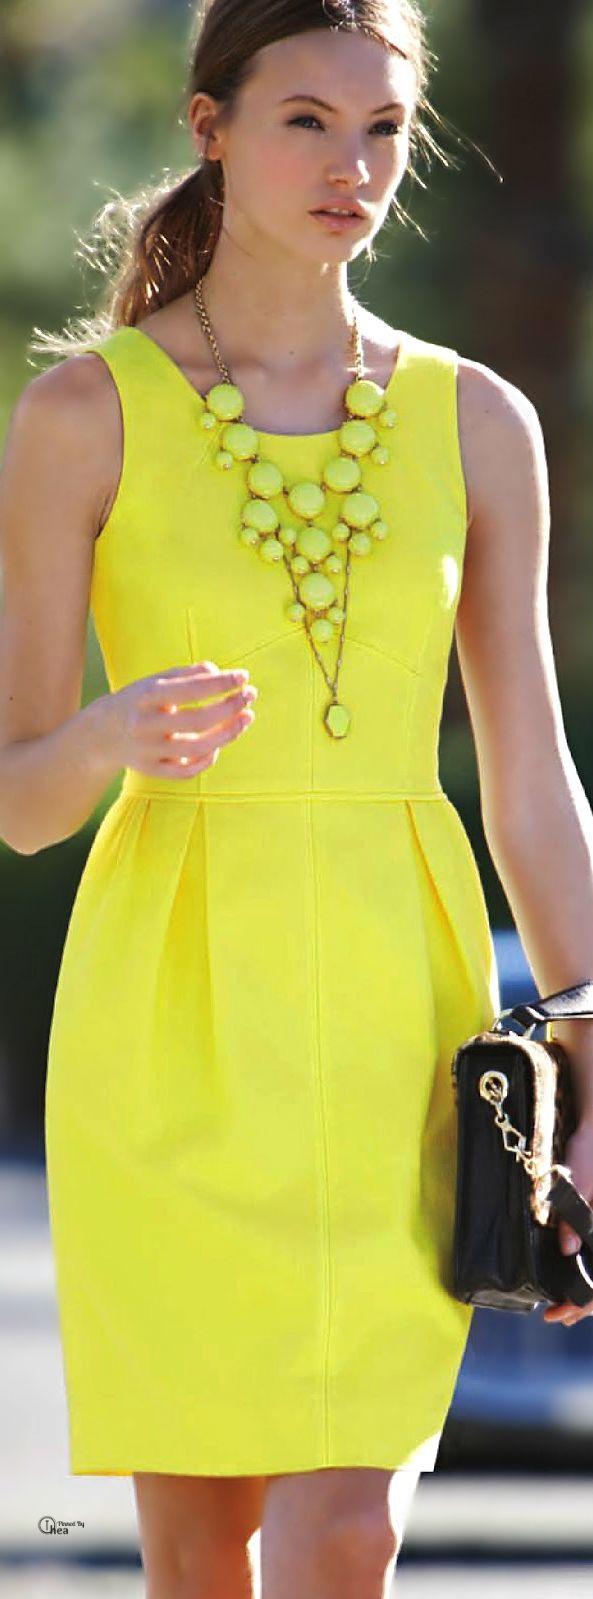 Gelbes kleid c&a